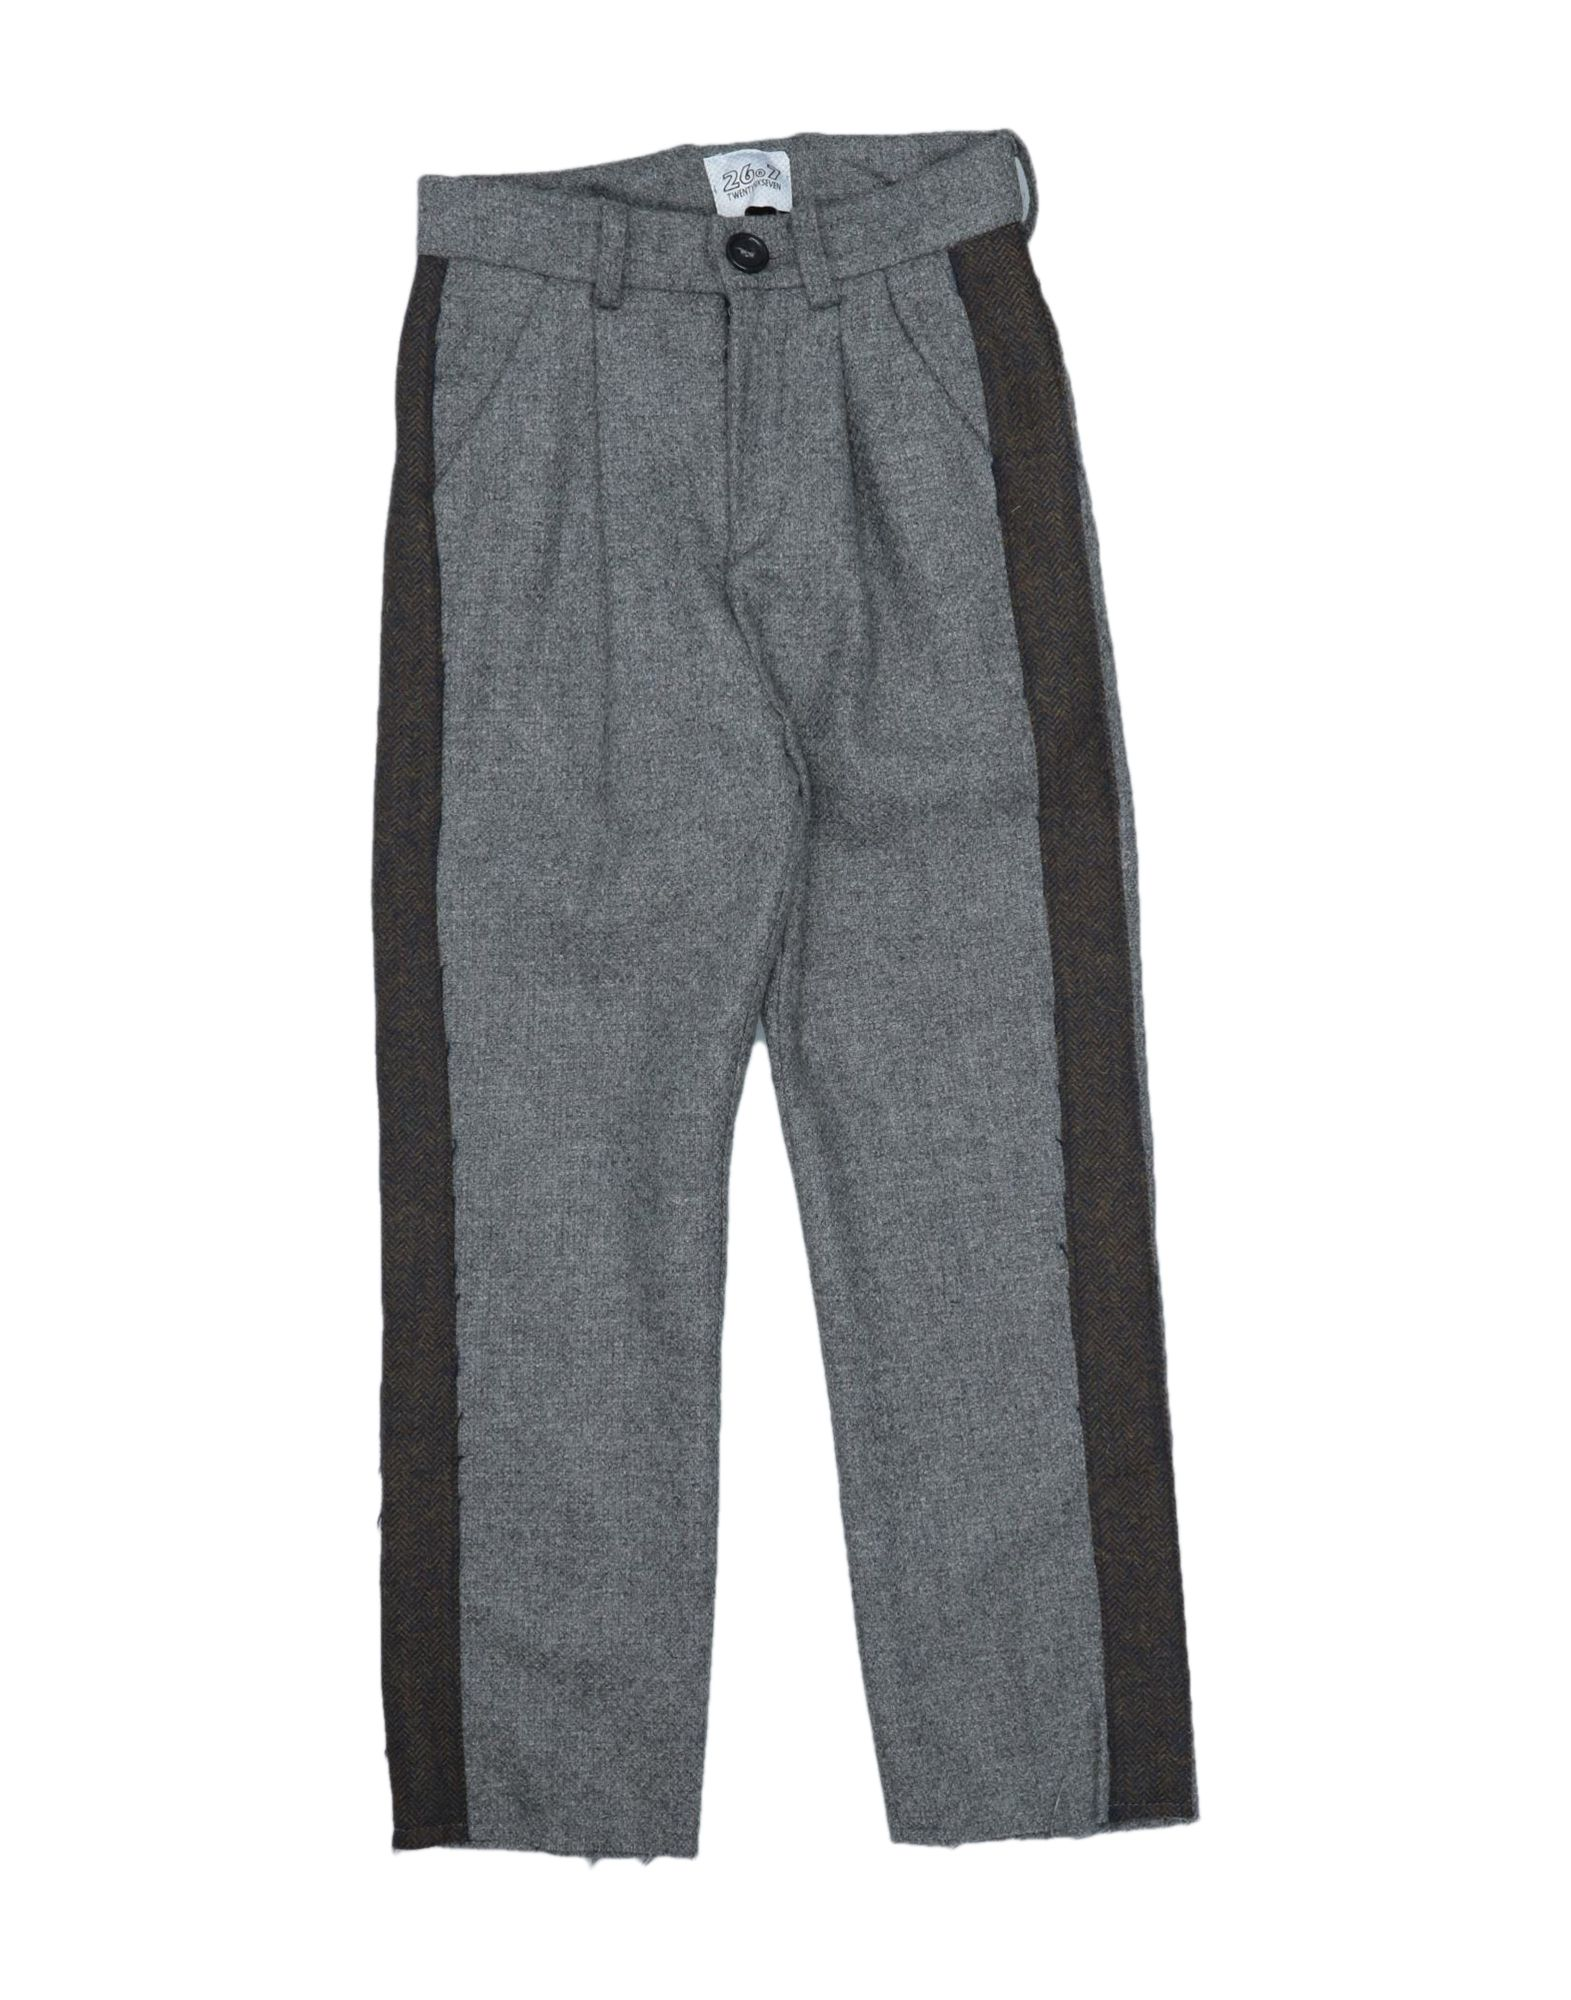 26.7 Twentysixseven Kids' Casual Pants In Grey